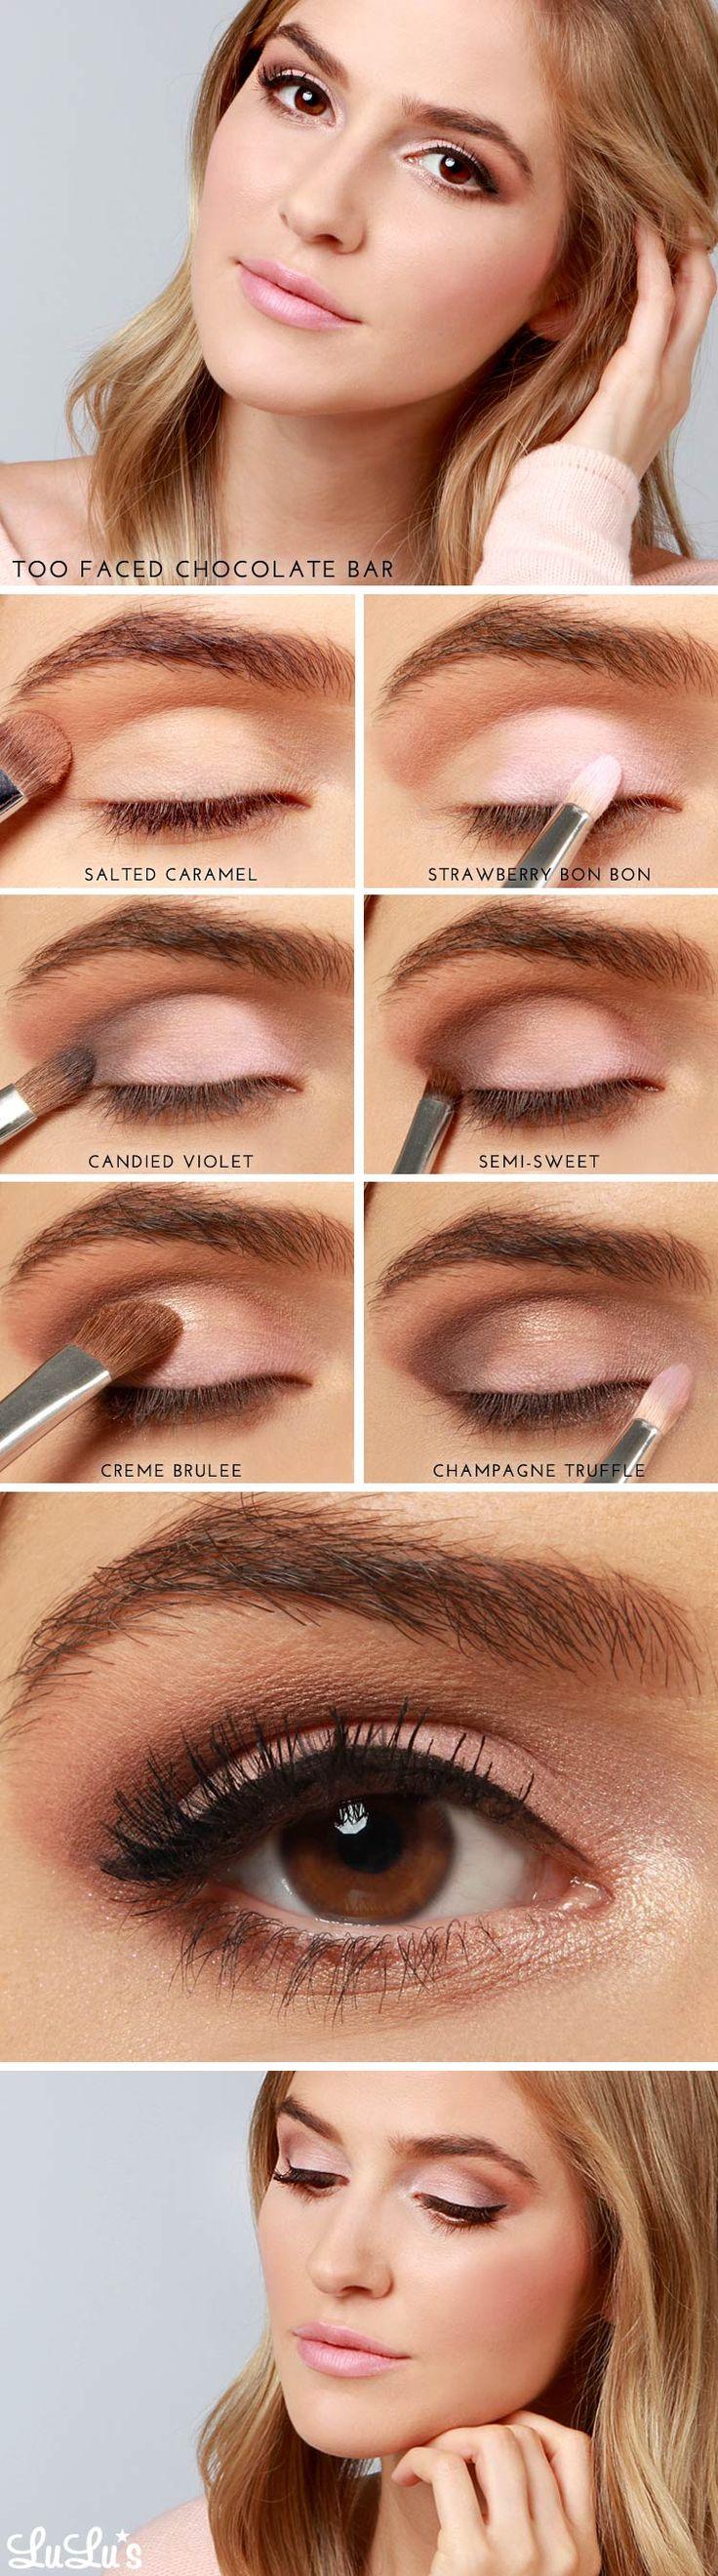 Best Ideas For Makeup Tutorials Amazing Eye Makeup Tutorial For A